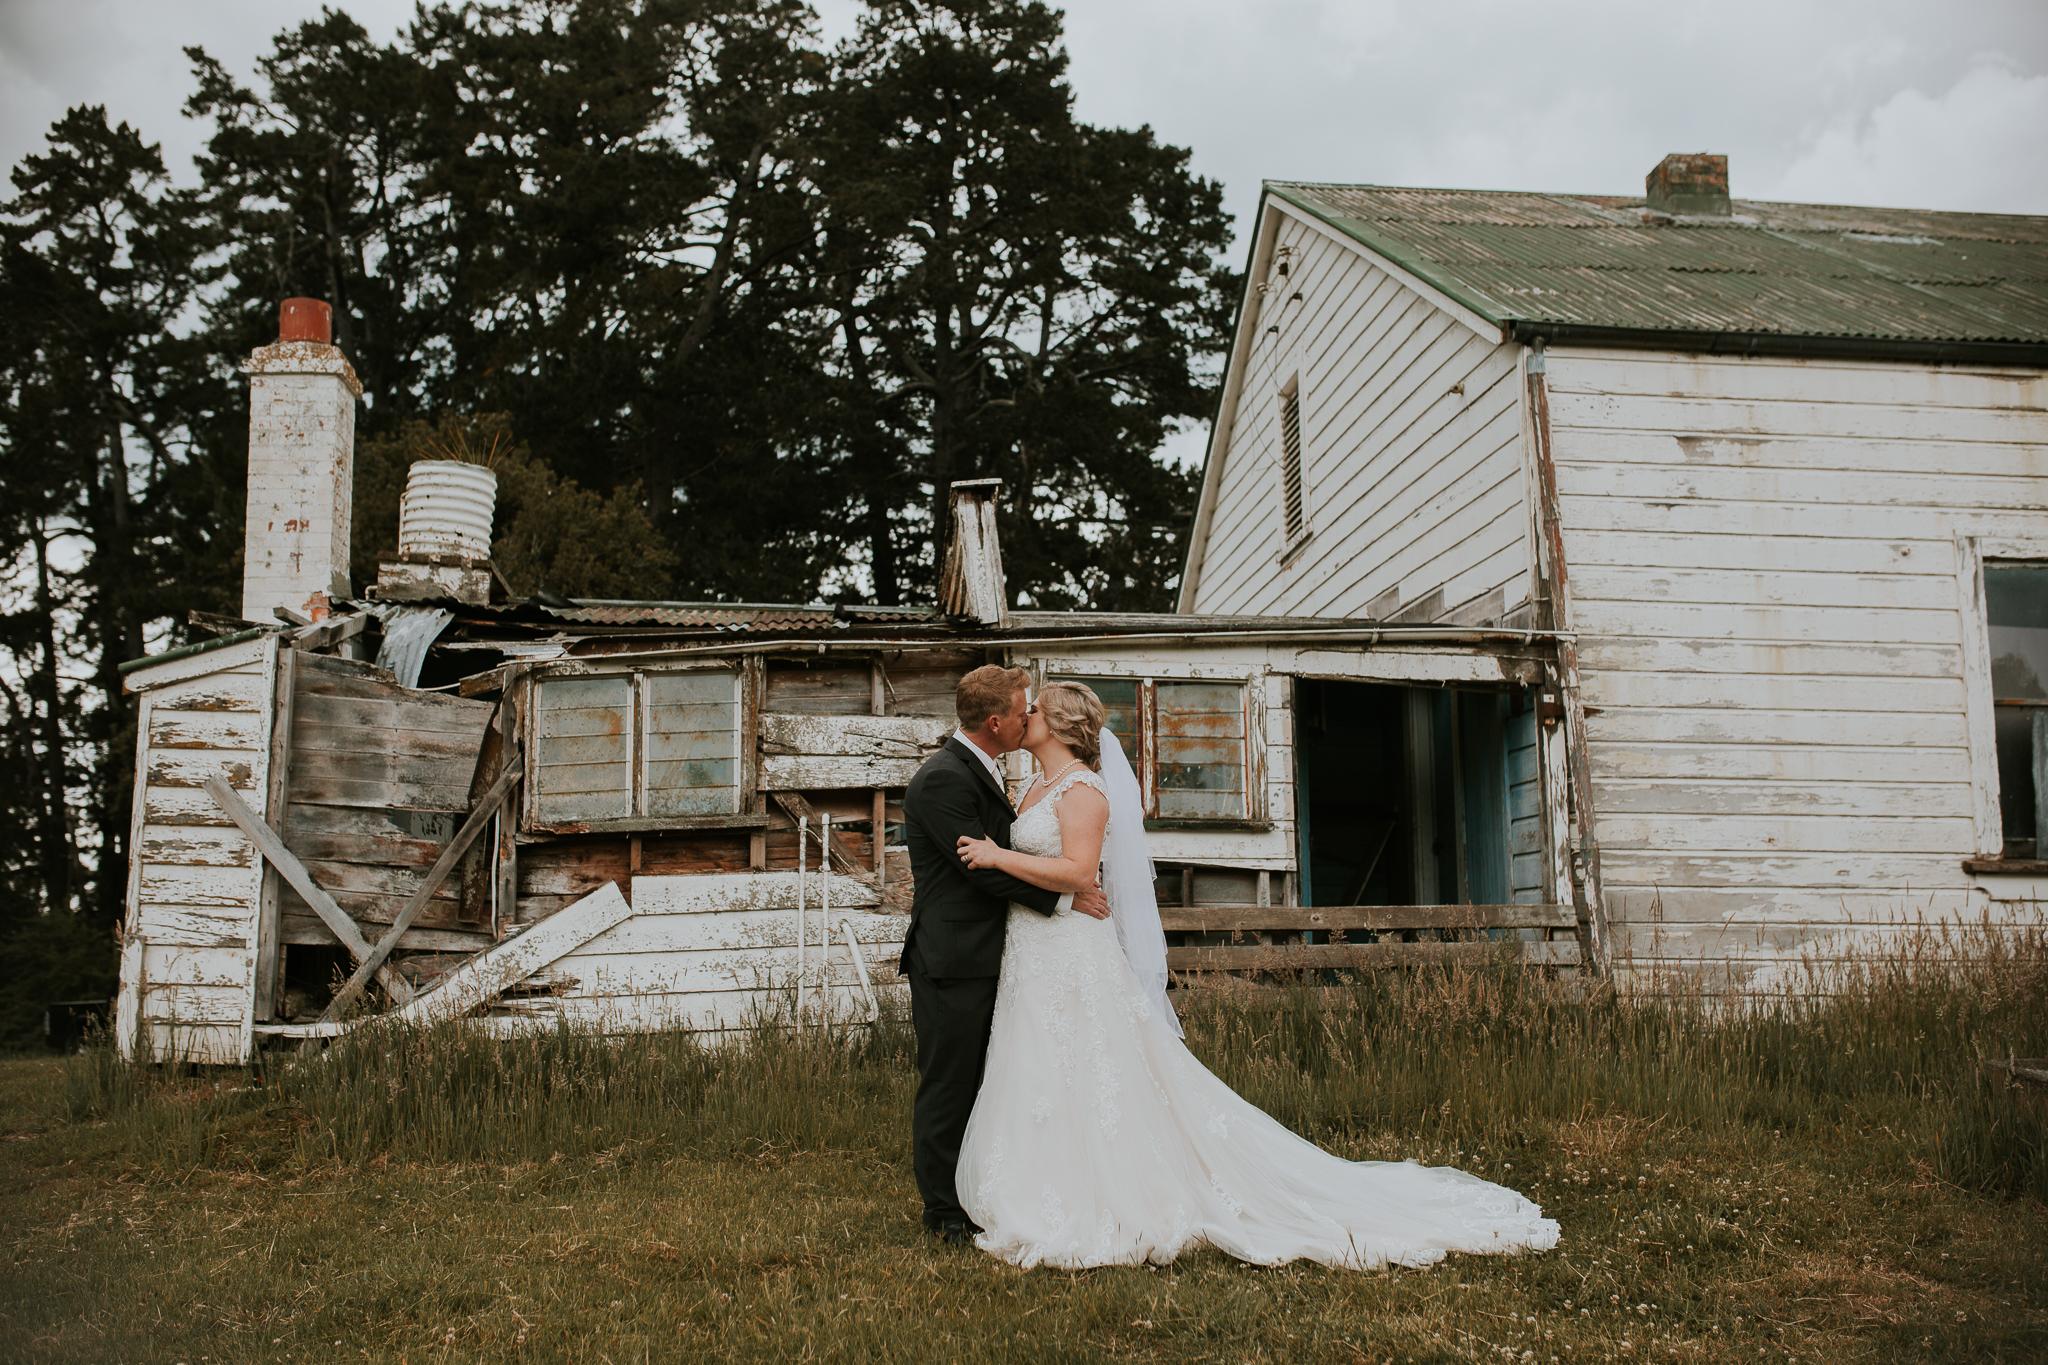 Lisa Fisher Photography gwavas homestead hawkebay-13.jpg